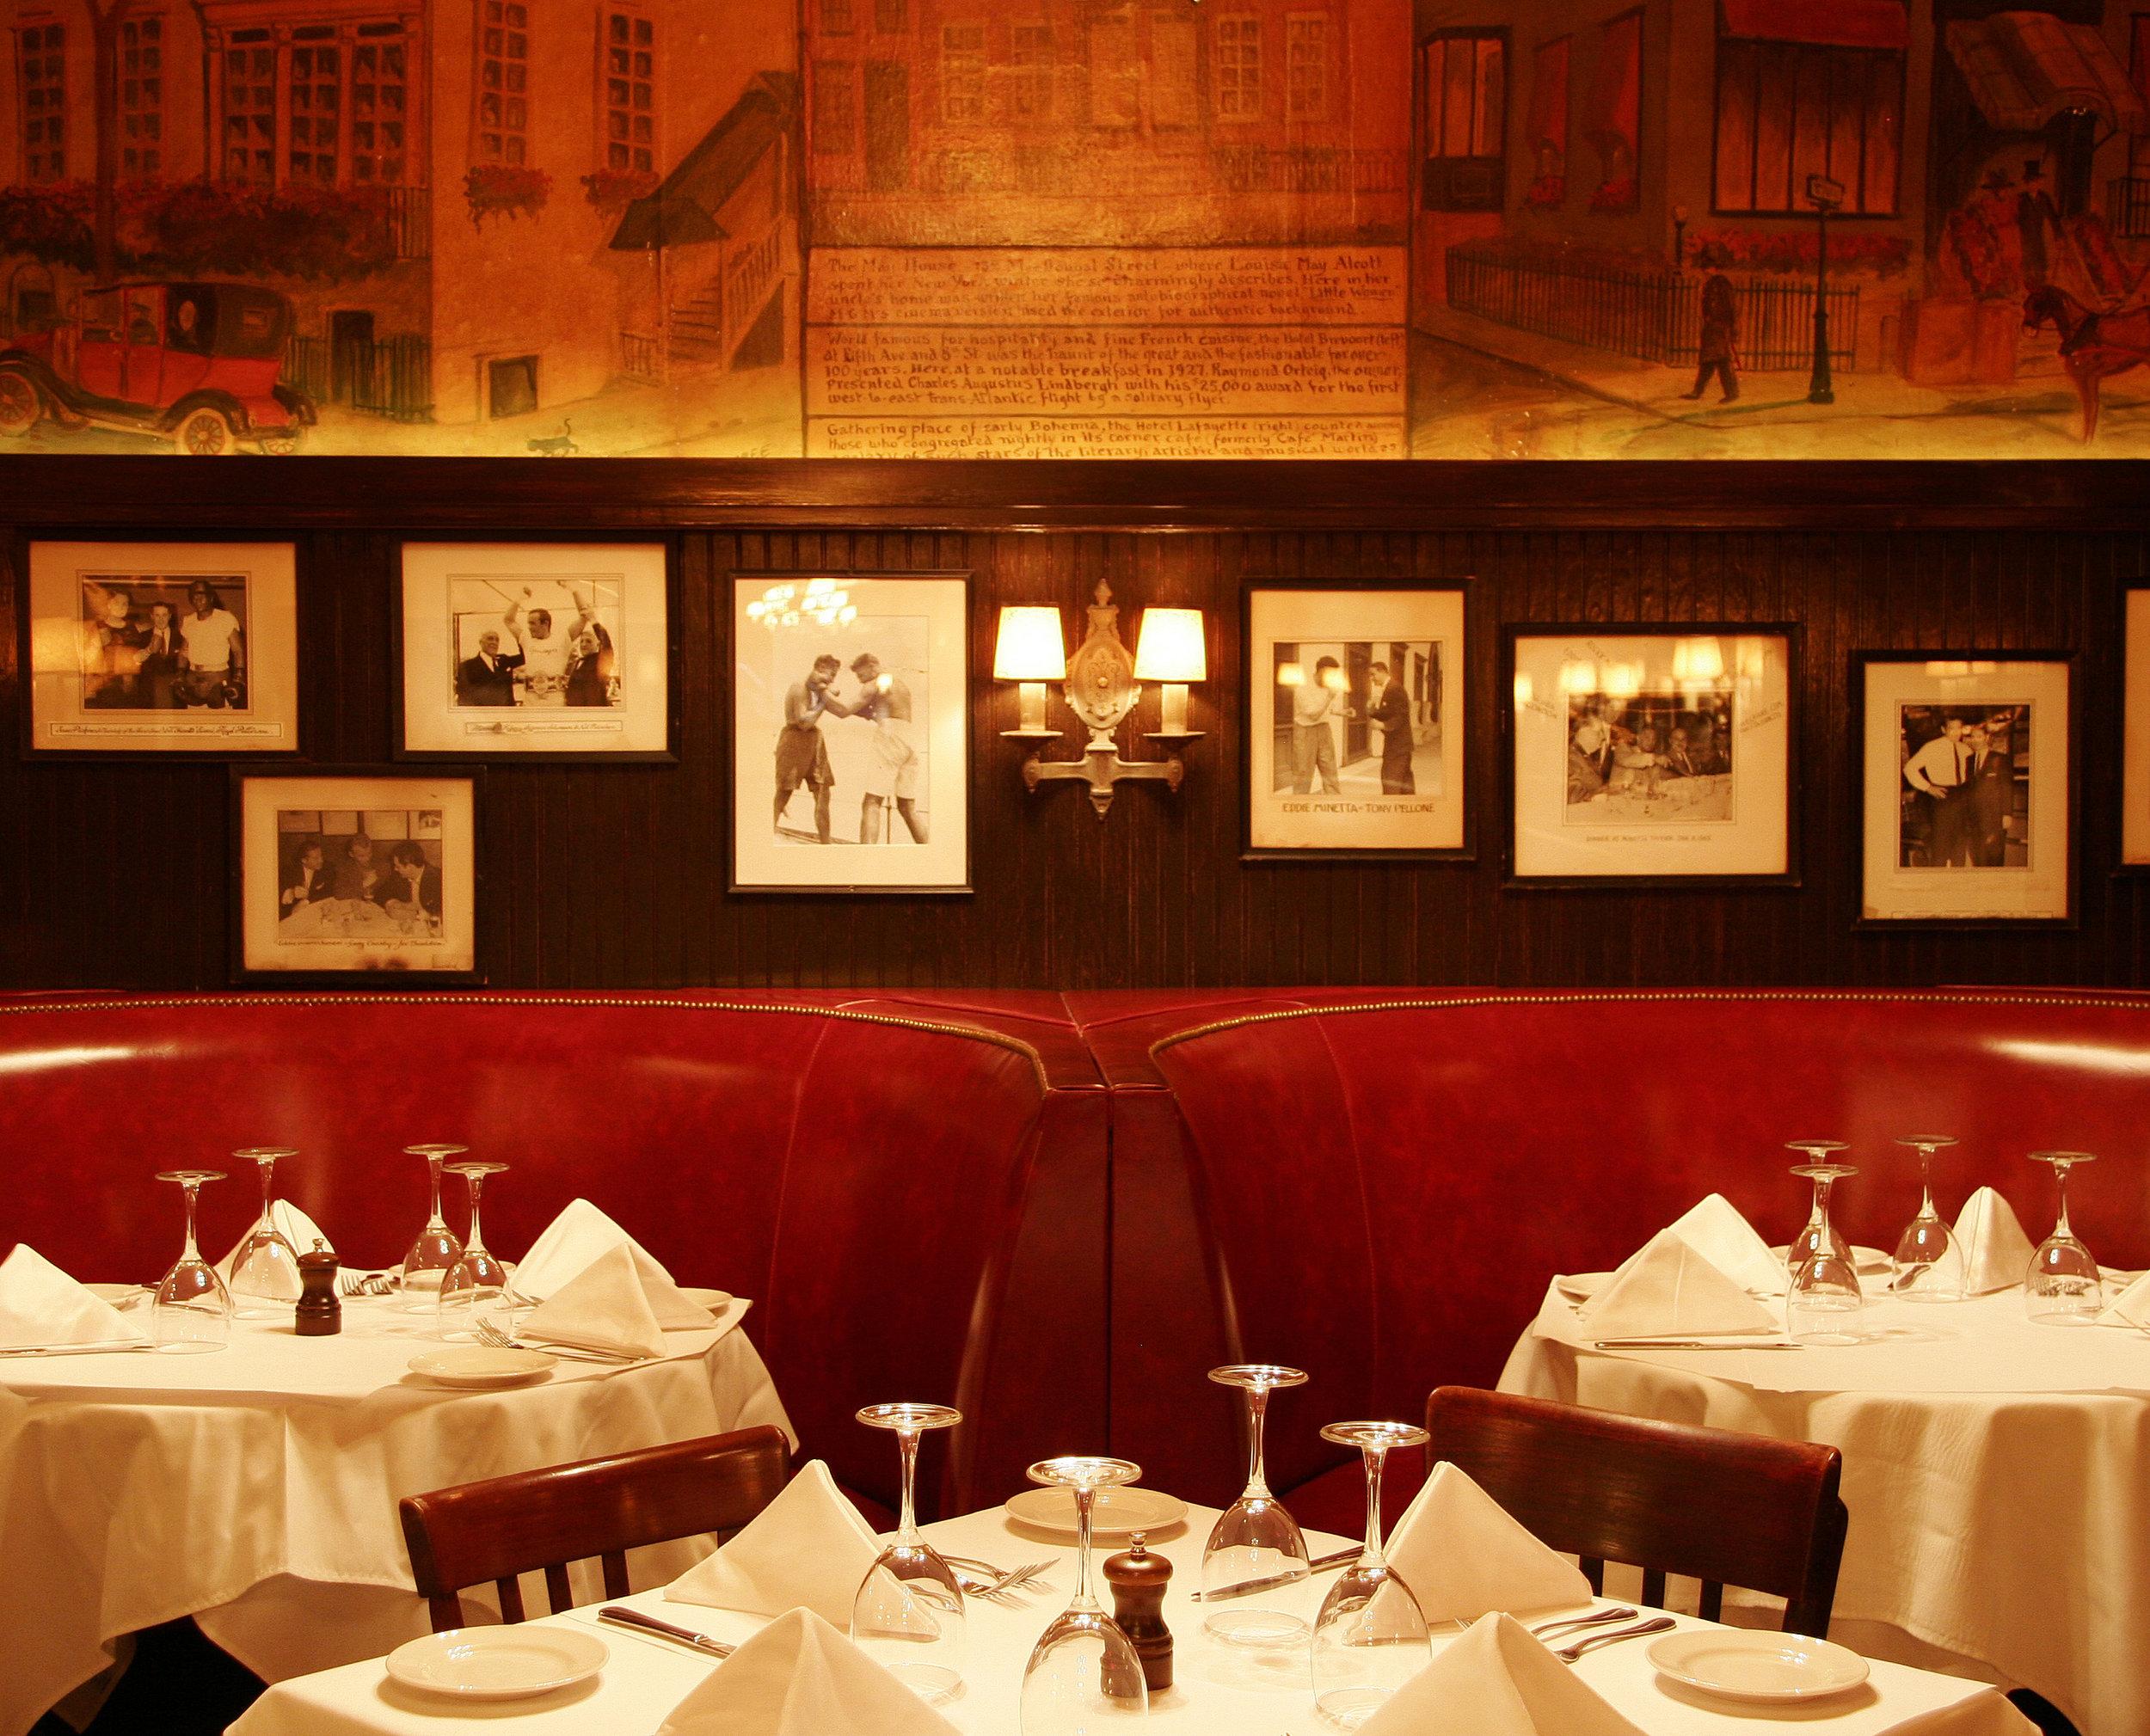 MinettaTavern_Dining Room Booths_Sylvia Paret_CROP.jpg